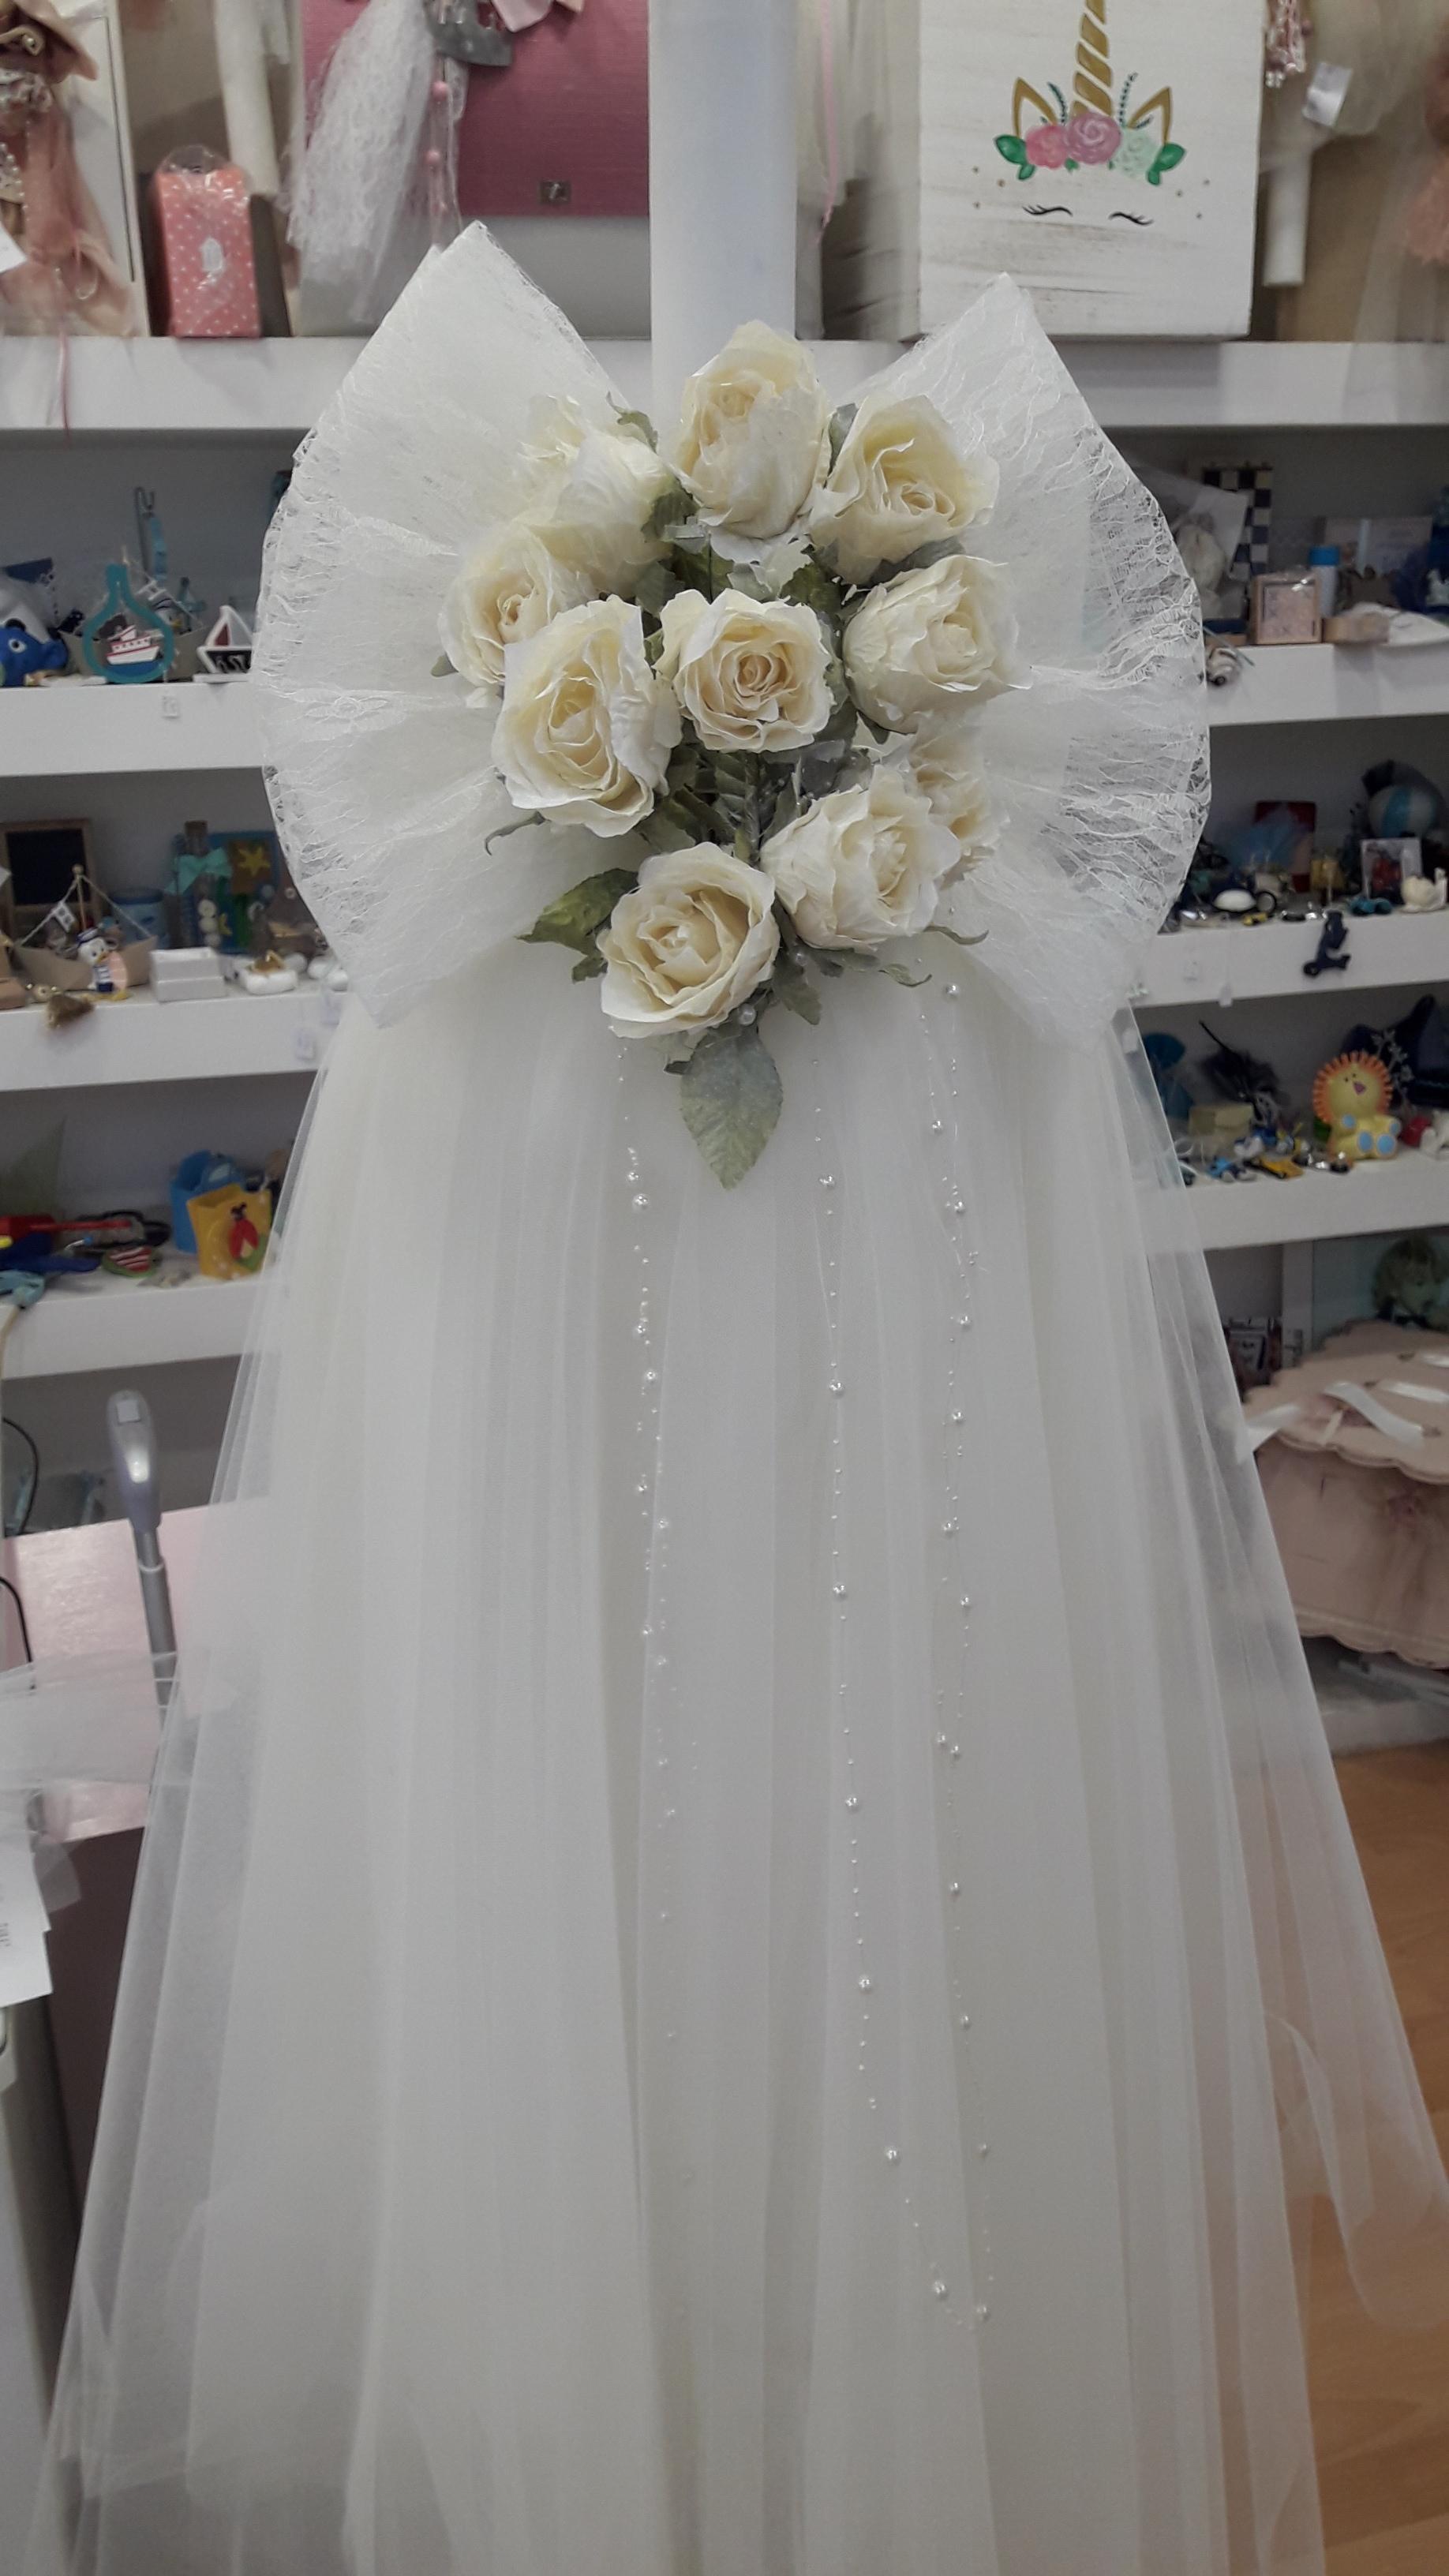 51ac9ae00123 λαμπαδες γαμου κλασσικες ρομαντικες τουλινες λουλουδια μεραξωτα